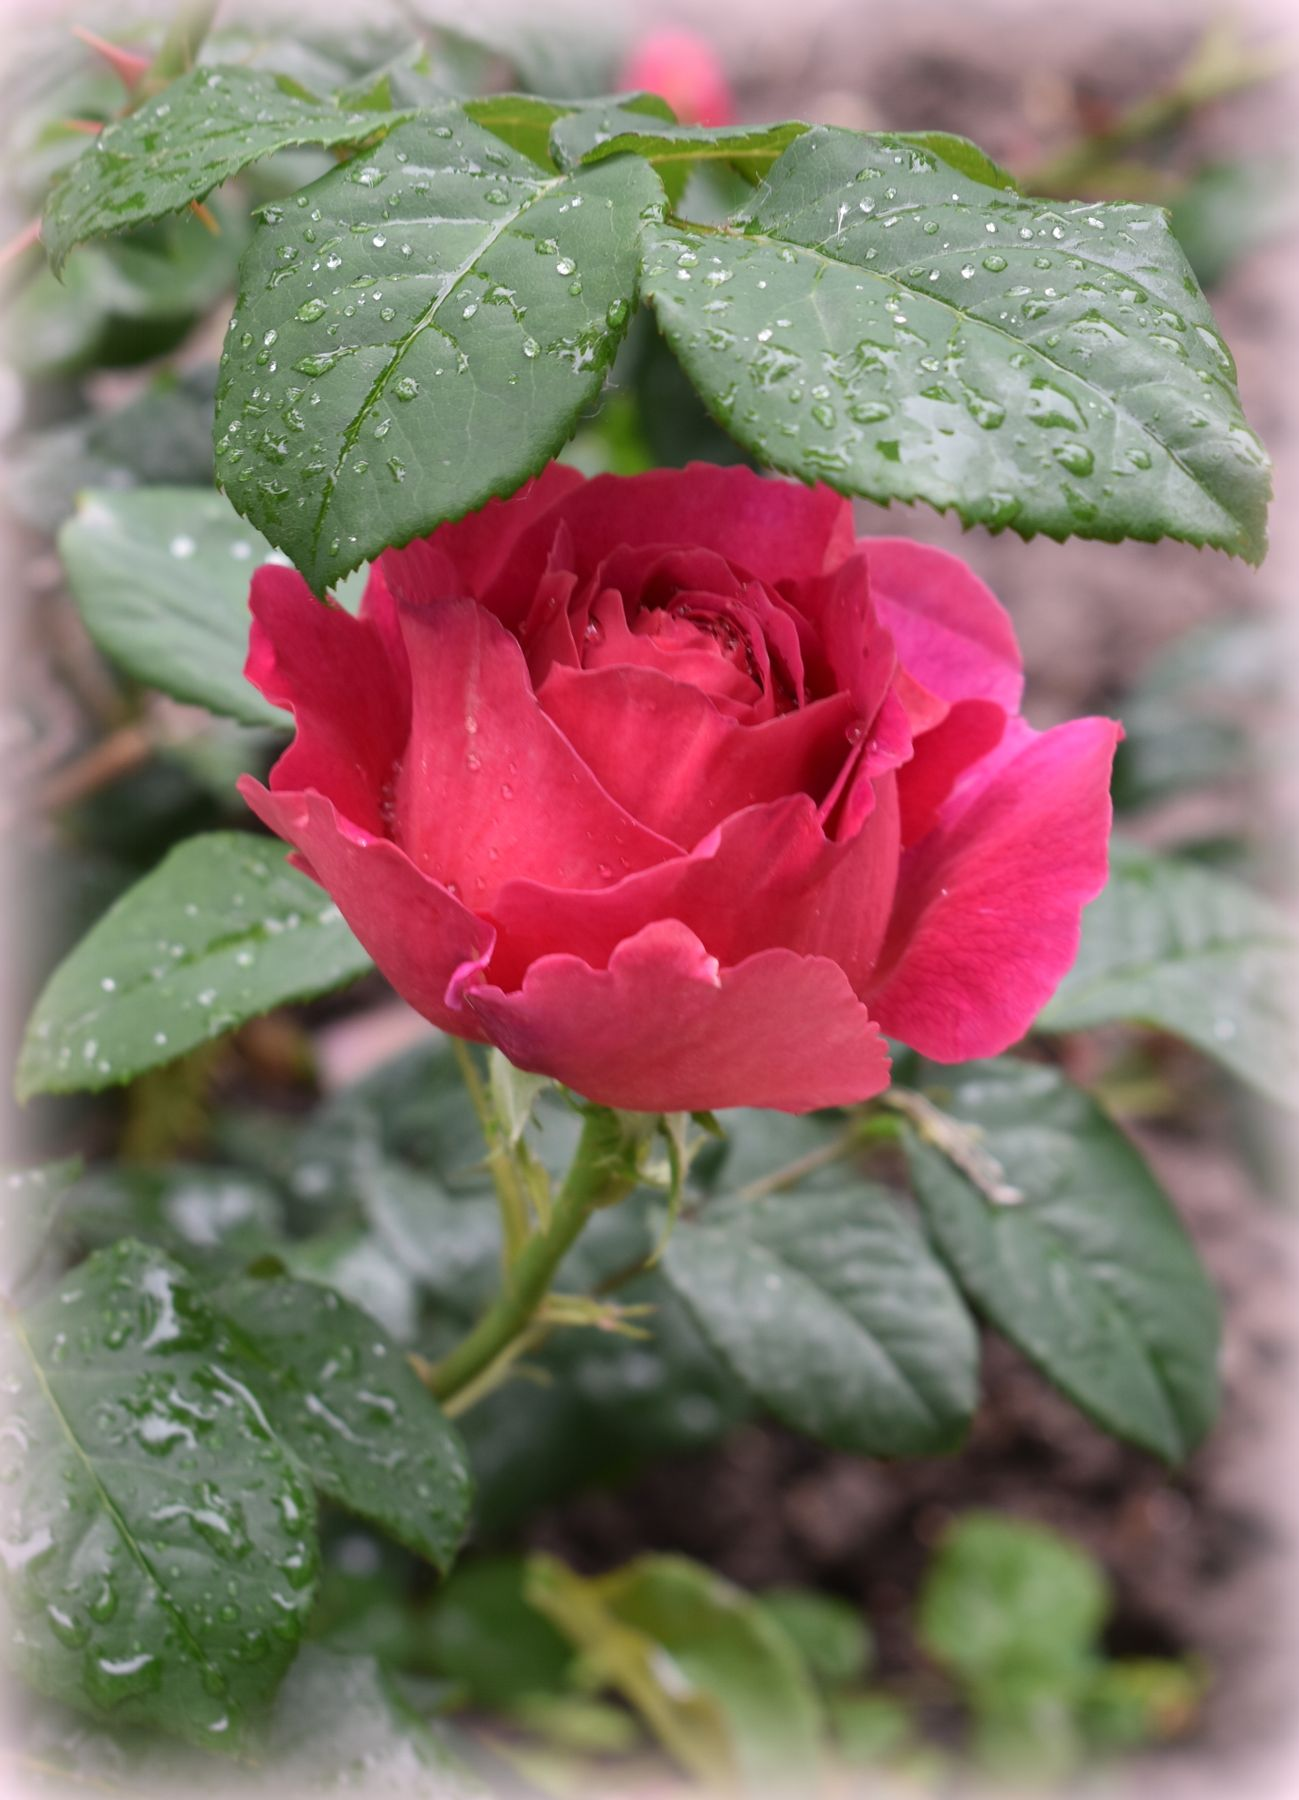 Зонтик лето июнь роза капли дождь лист